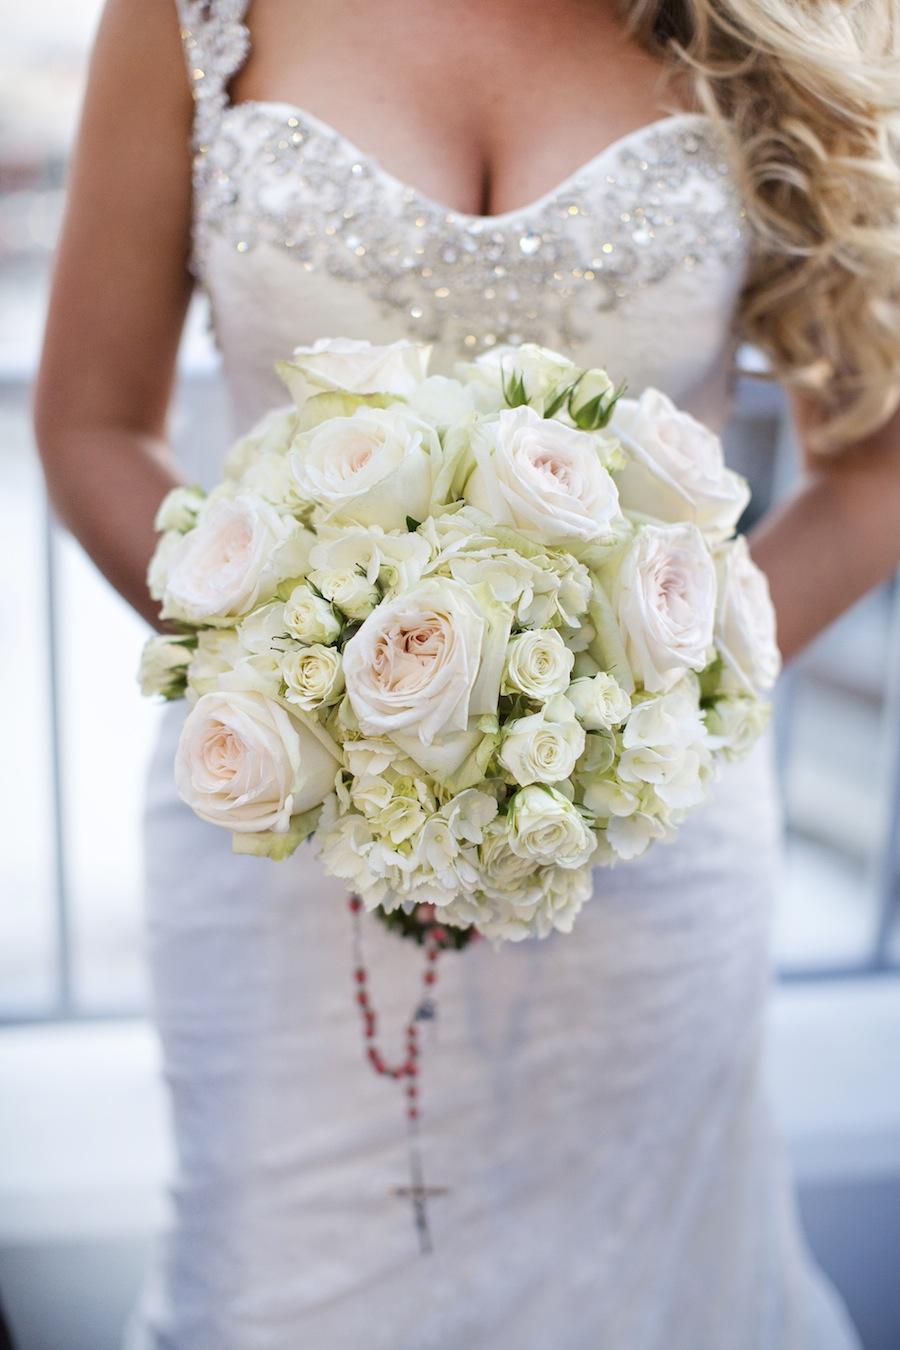 White Rose Wedding Bouquet | Tampa Wedding Florist Apple Blossoms Floral Designs